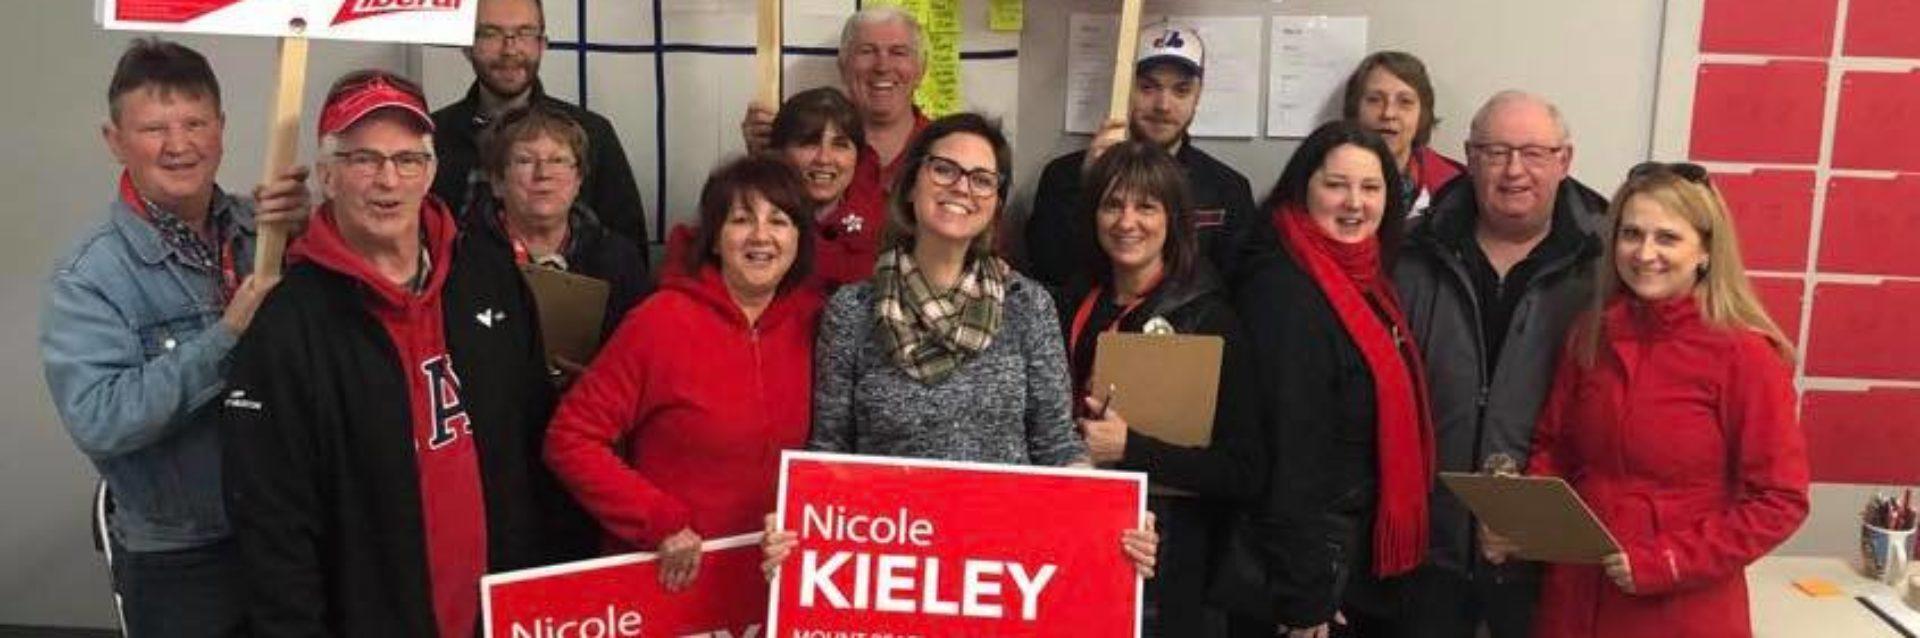 Nicole Kieley